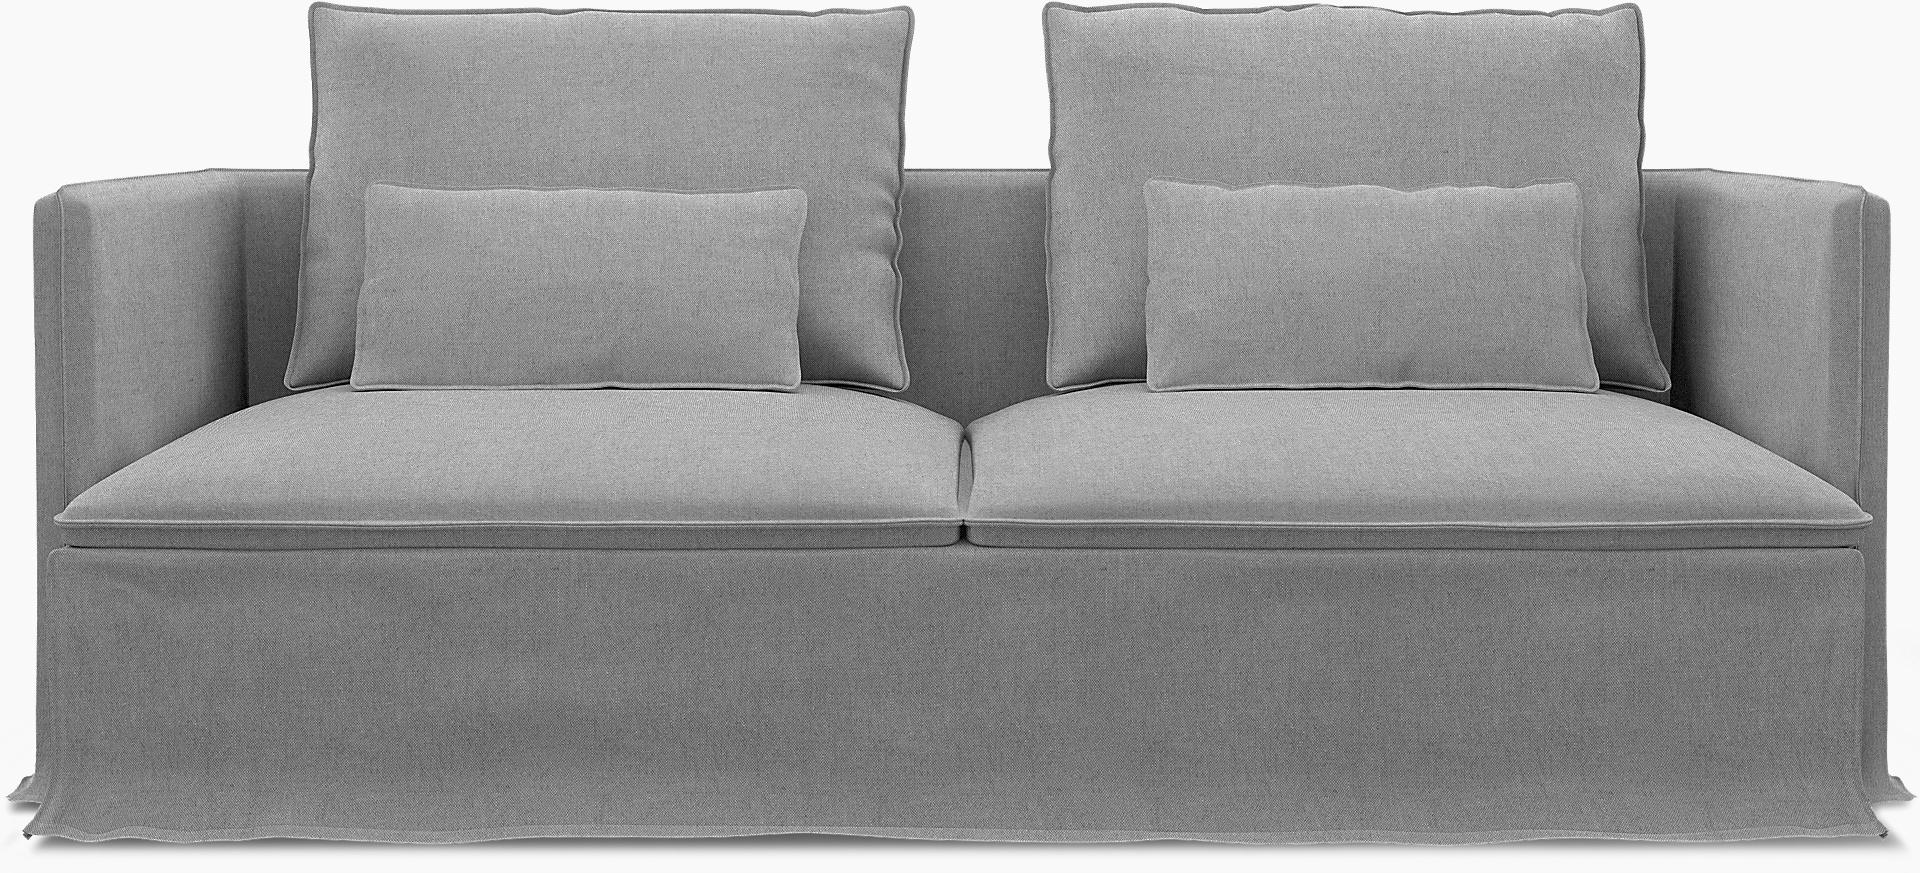 Phenomenal Ikea Soderhamn Sofa Bed Cover Loose Fit Bemz Uwap Interior Chair Design Uwaporg